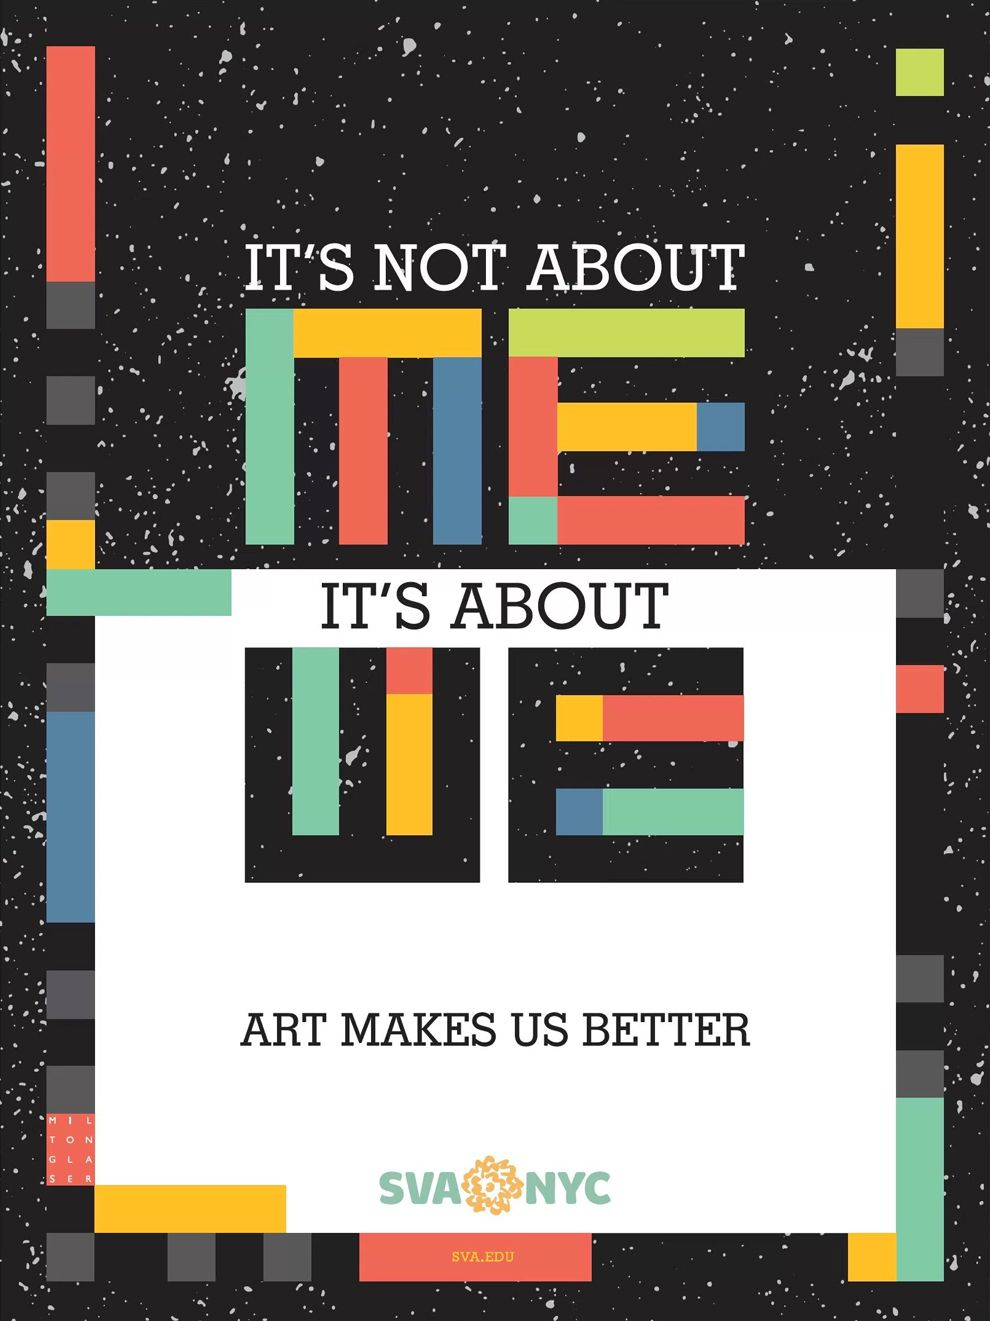 Milton Glaser's Underground Images Political Print Design